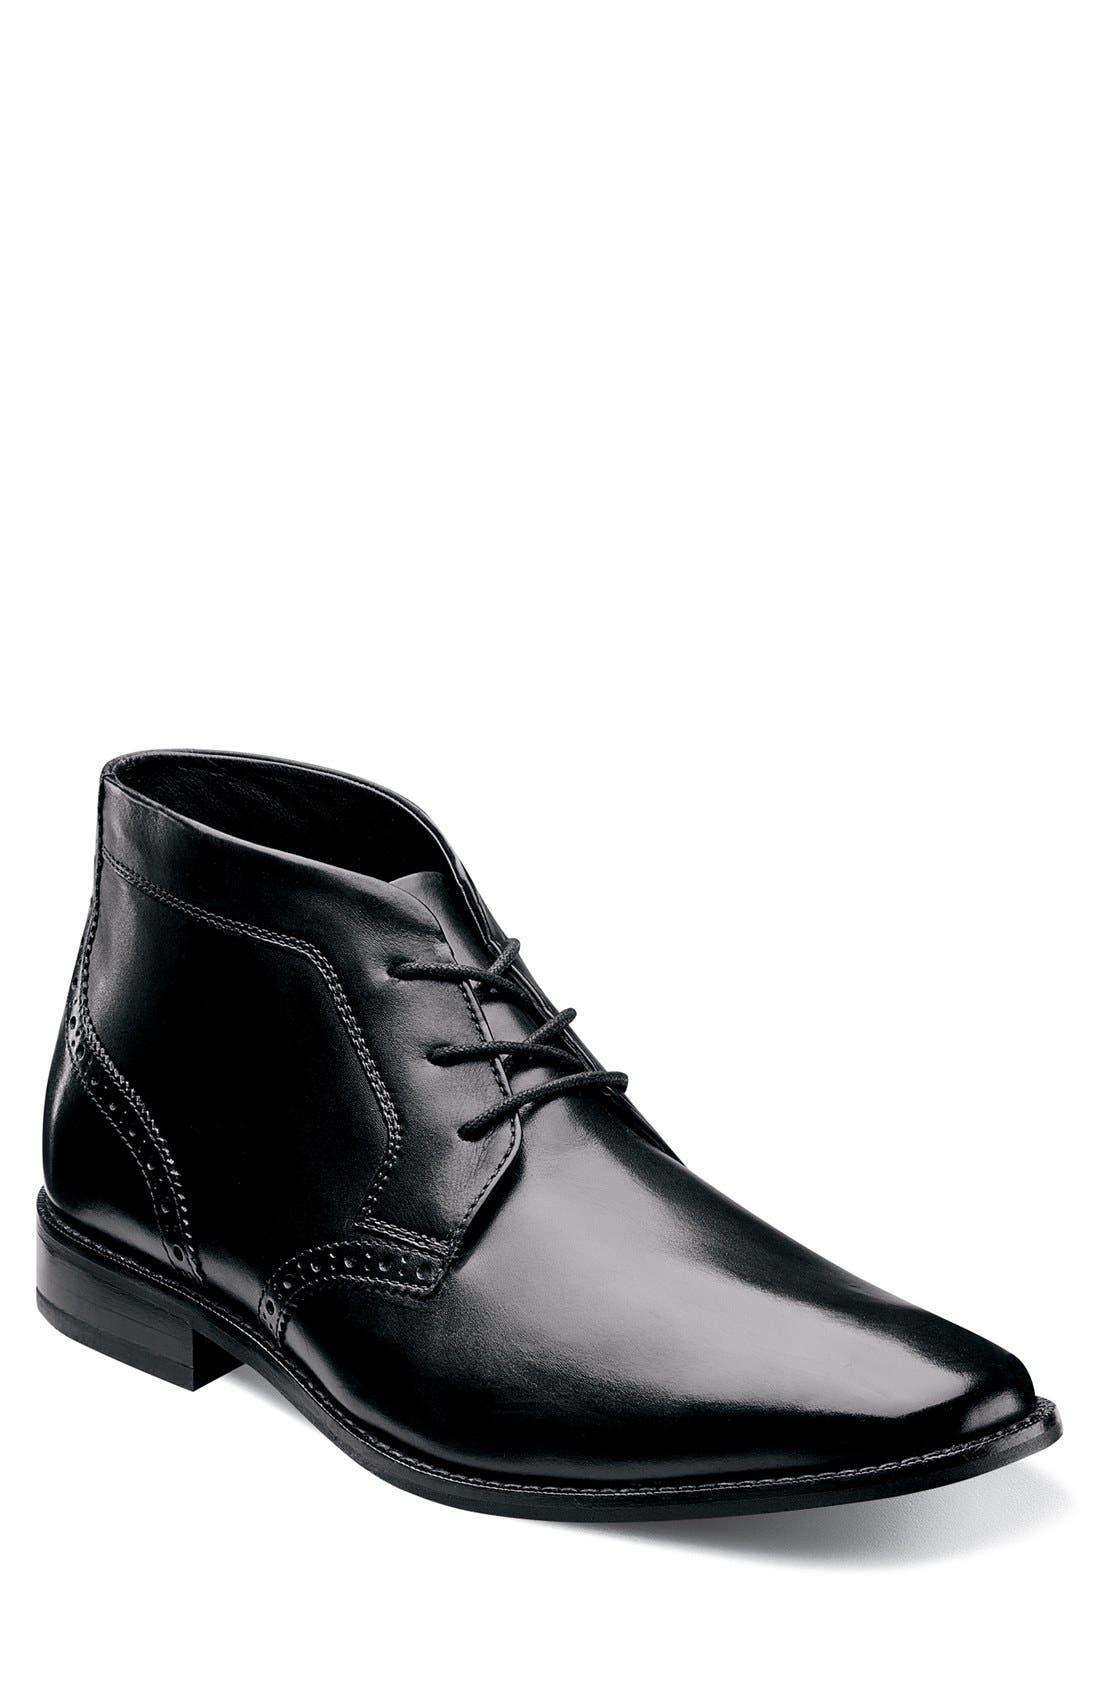 'Castellano' Chukka Boot,                             Main thumbnail 1, color,                             001